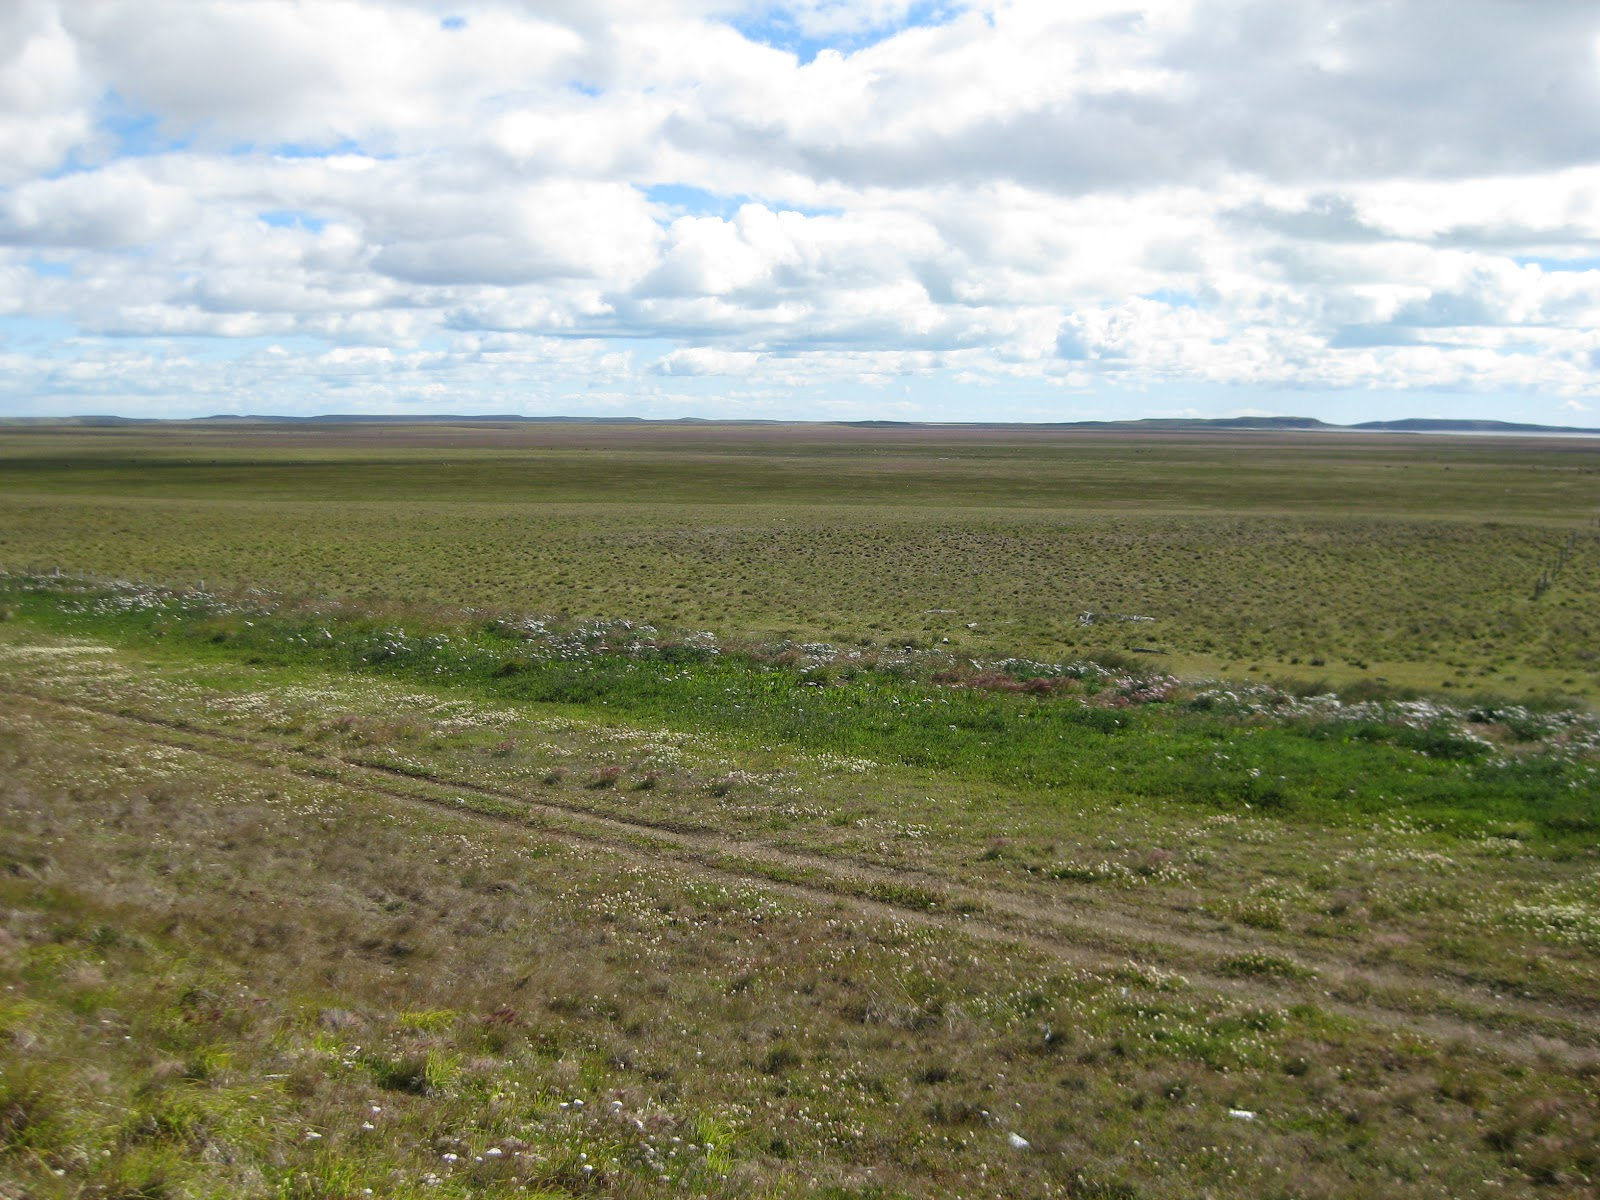 Boring flat grasslands